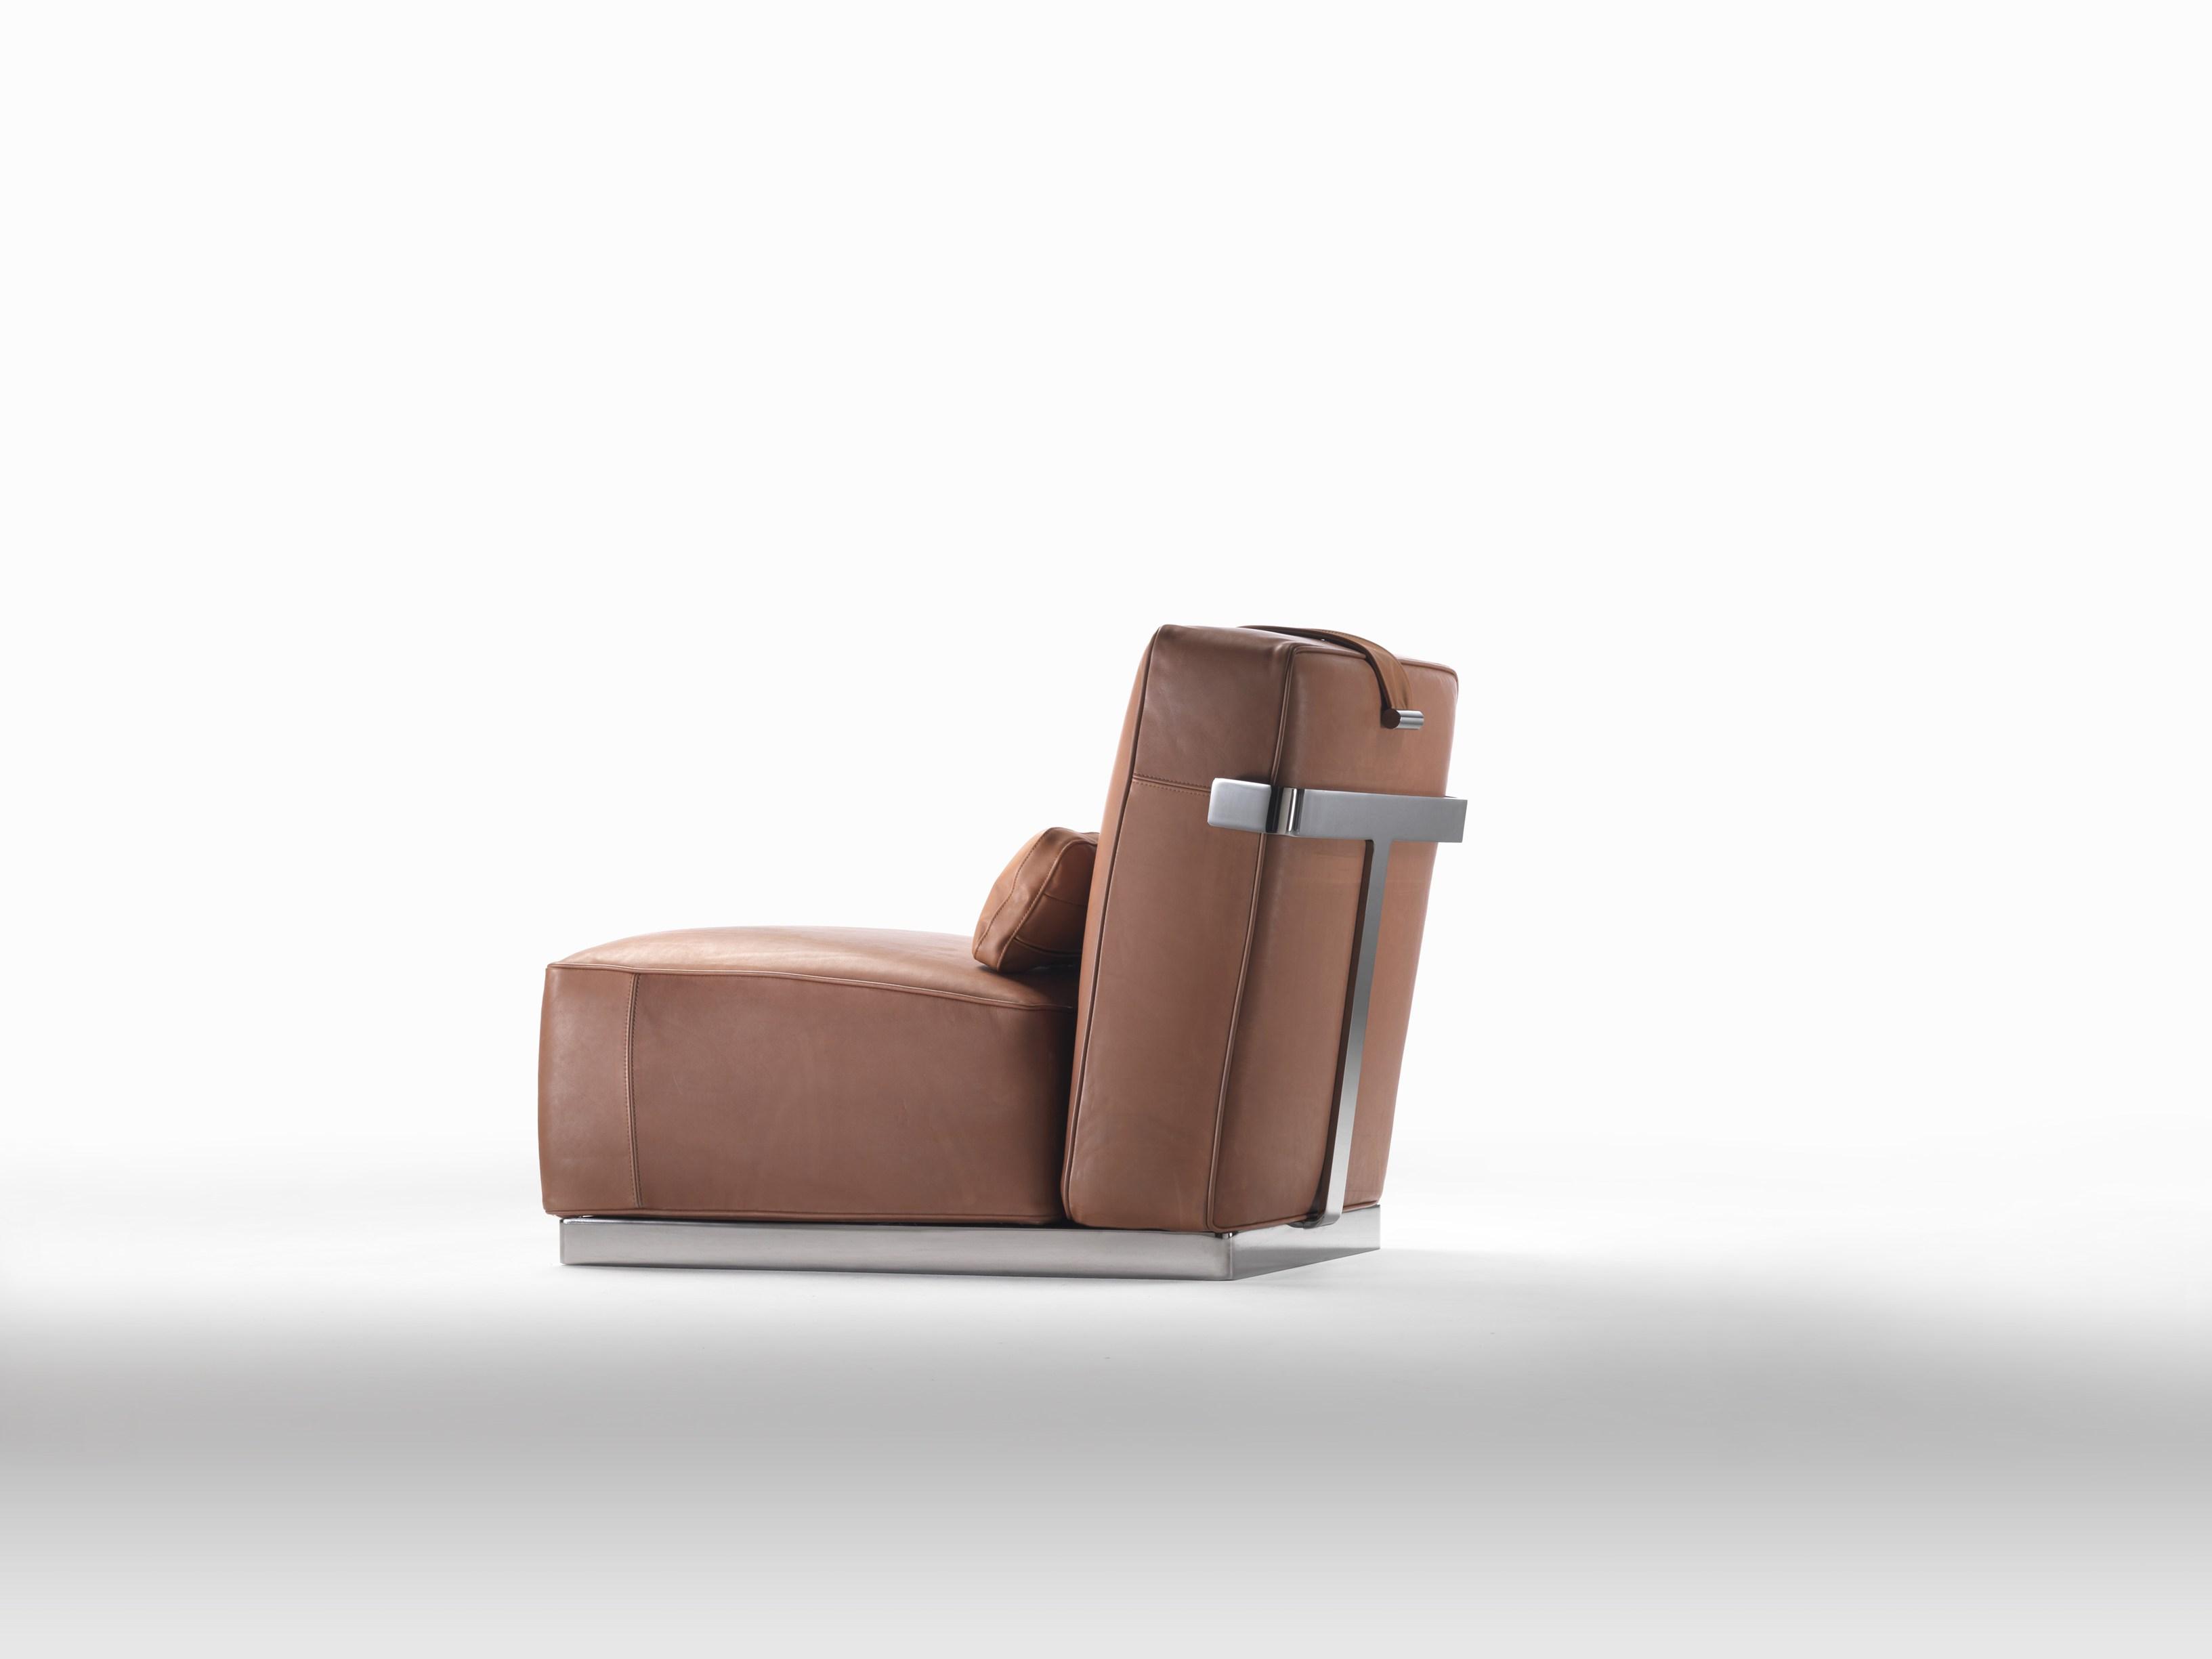 A.B.C.D Chair by Antonio Citterio for Flexform